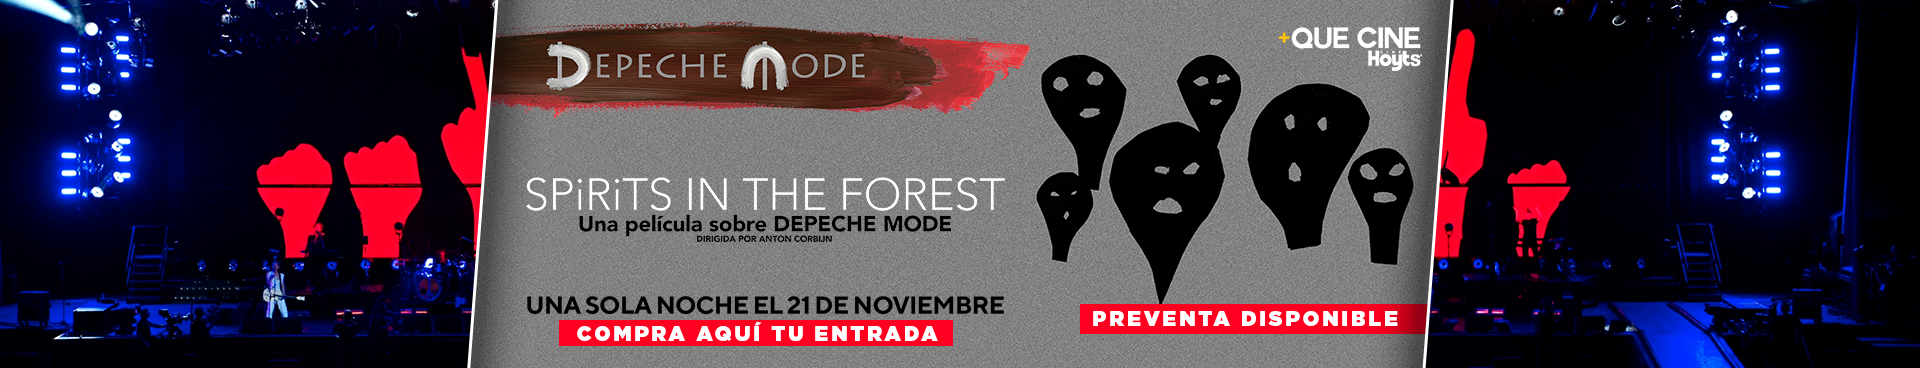 PREVENTAS +QUE CINE:  DEPECHE MODE: SPIRITS IN THE FOREST, 21 DE NOVIEMBRE COMPRA AQUÍ TU ENTRADA